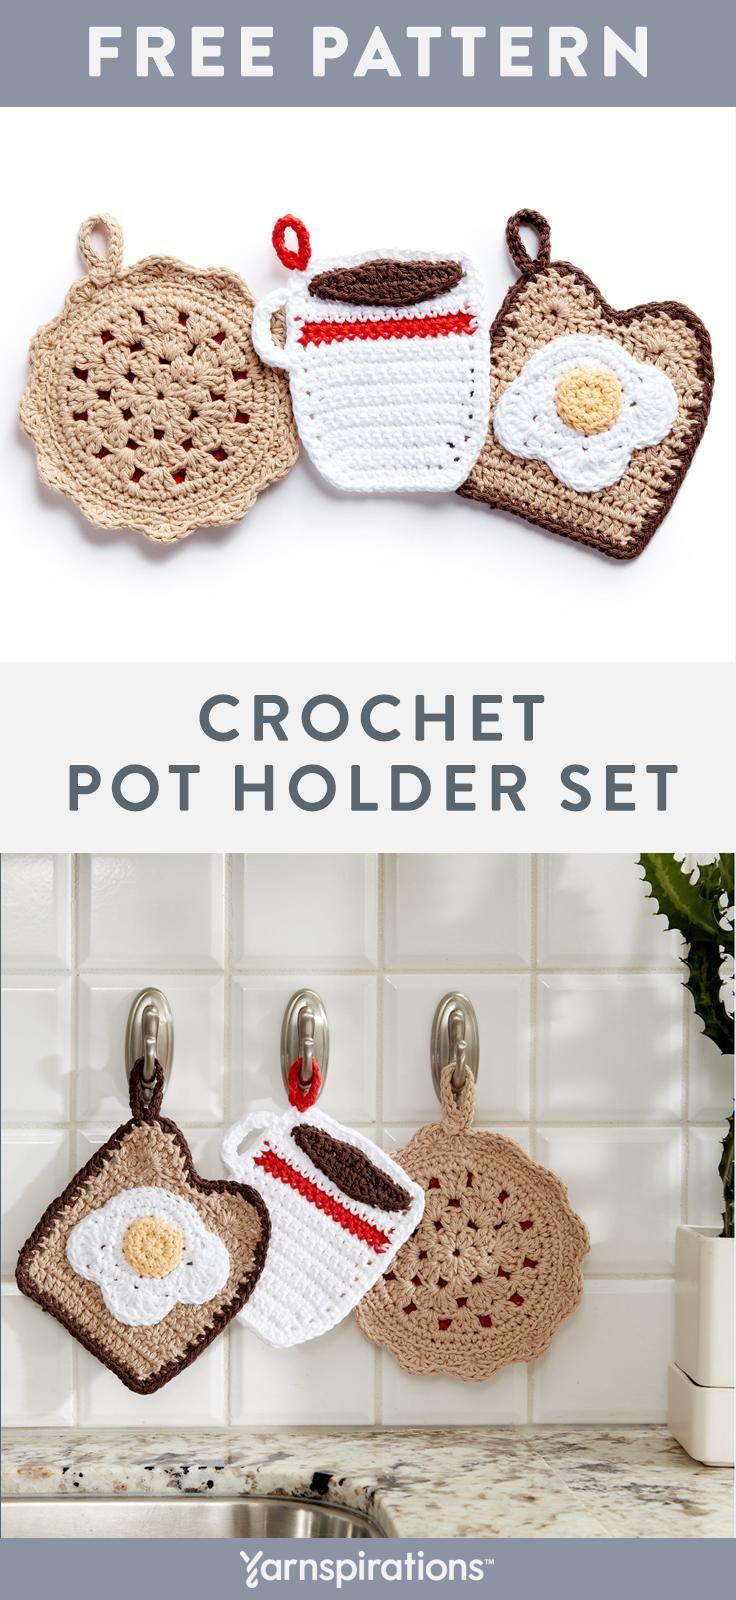 Free Decorative Crochet Pot Holder Patterns | Hostess Gift Ideas ...